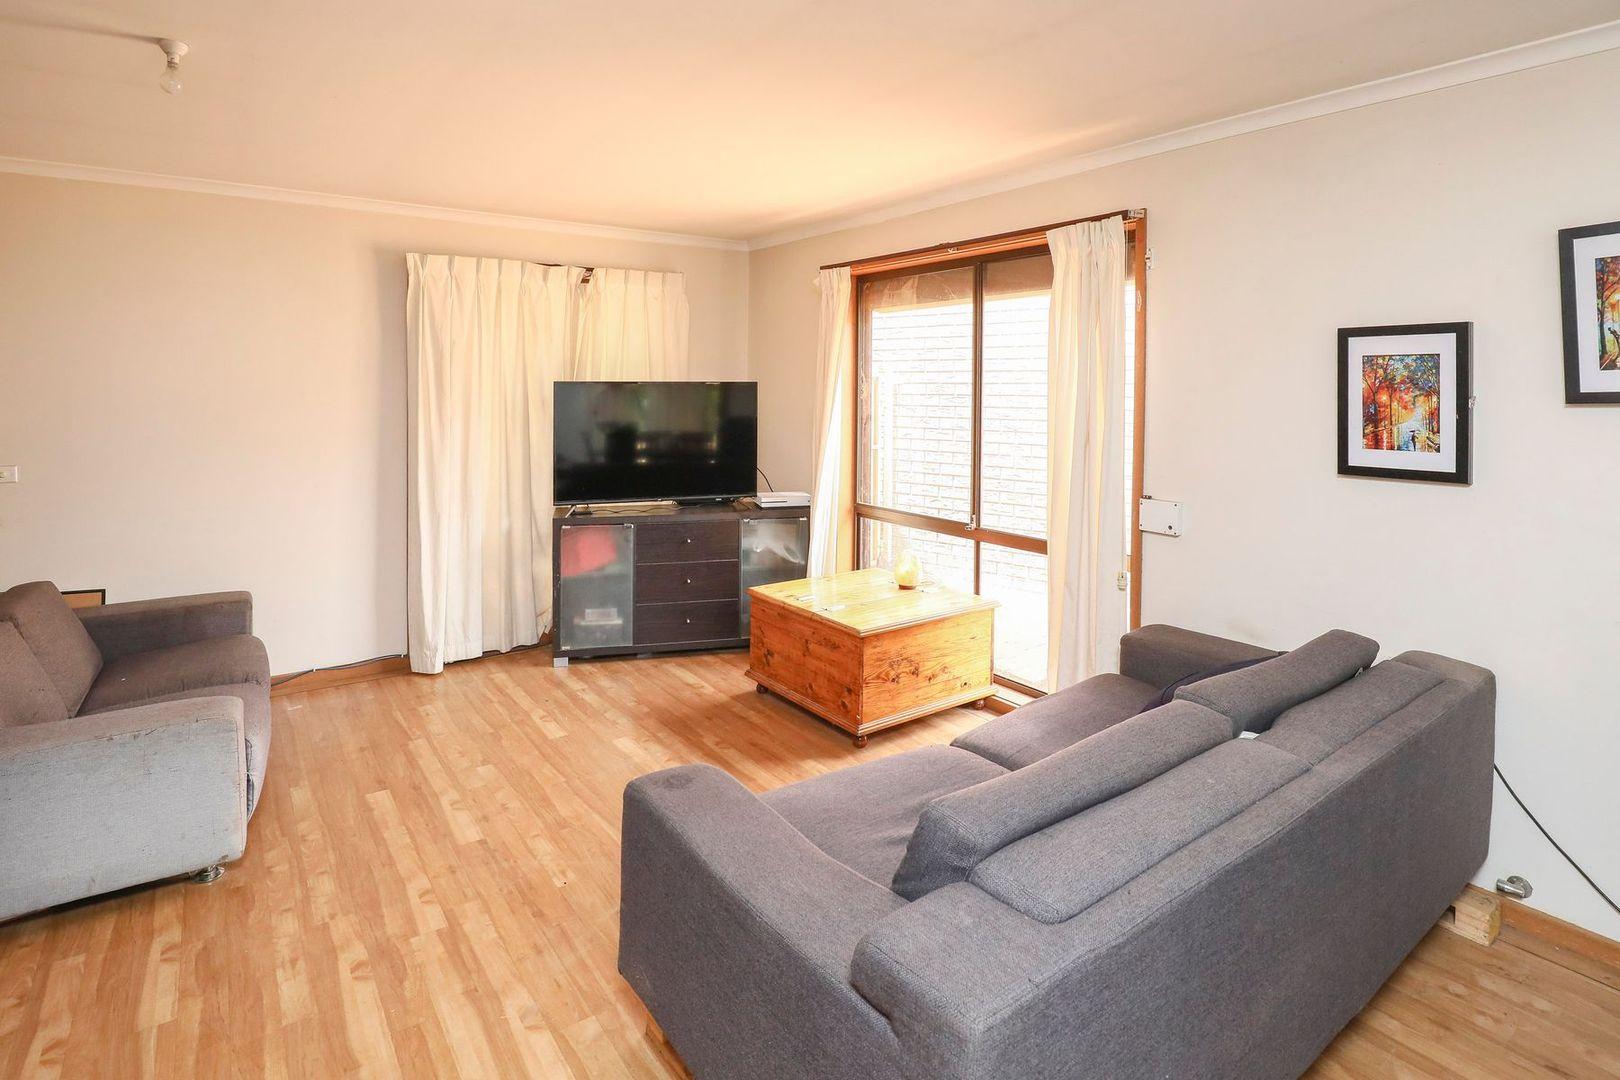 6 Zhoe Court, Mildura VIC 3500, Image 2